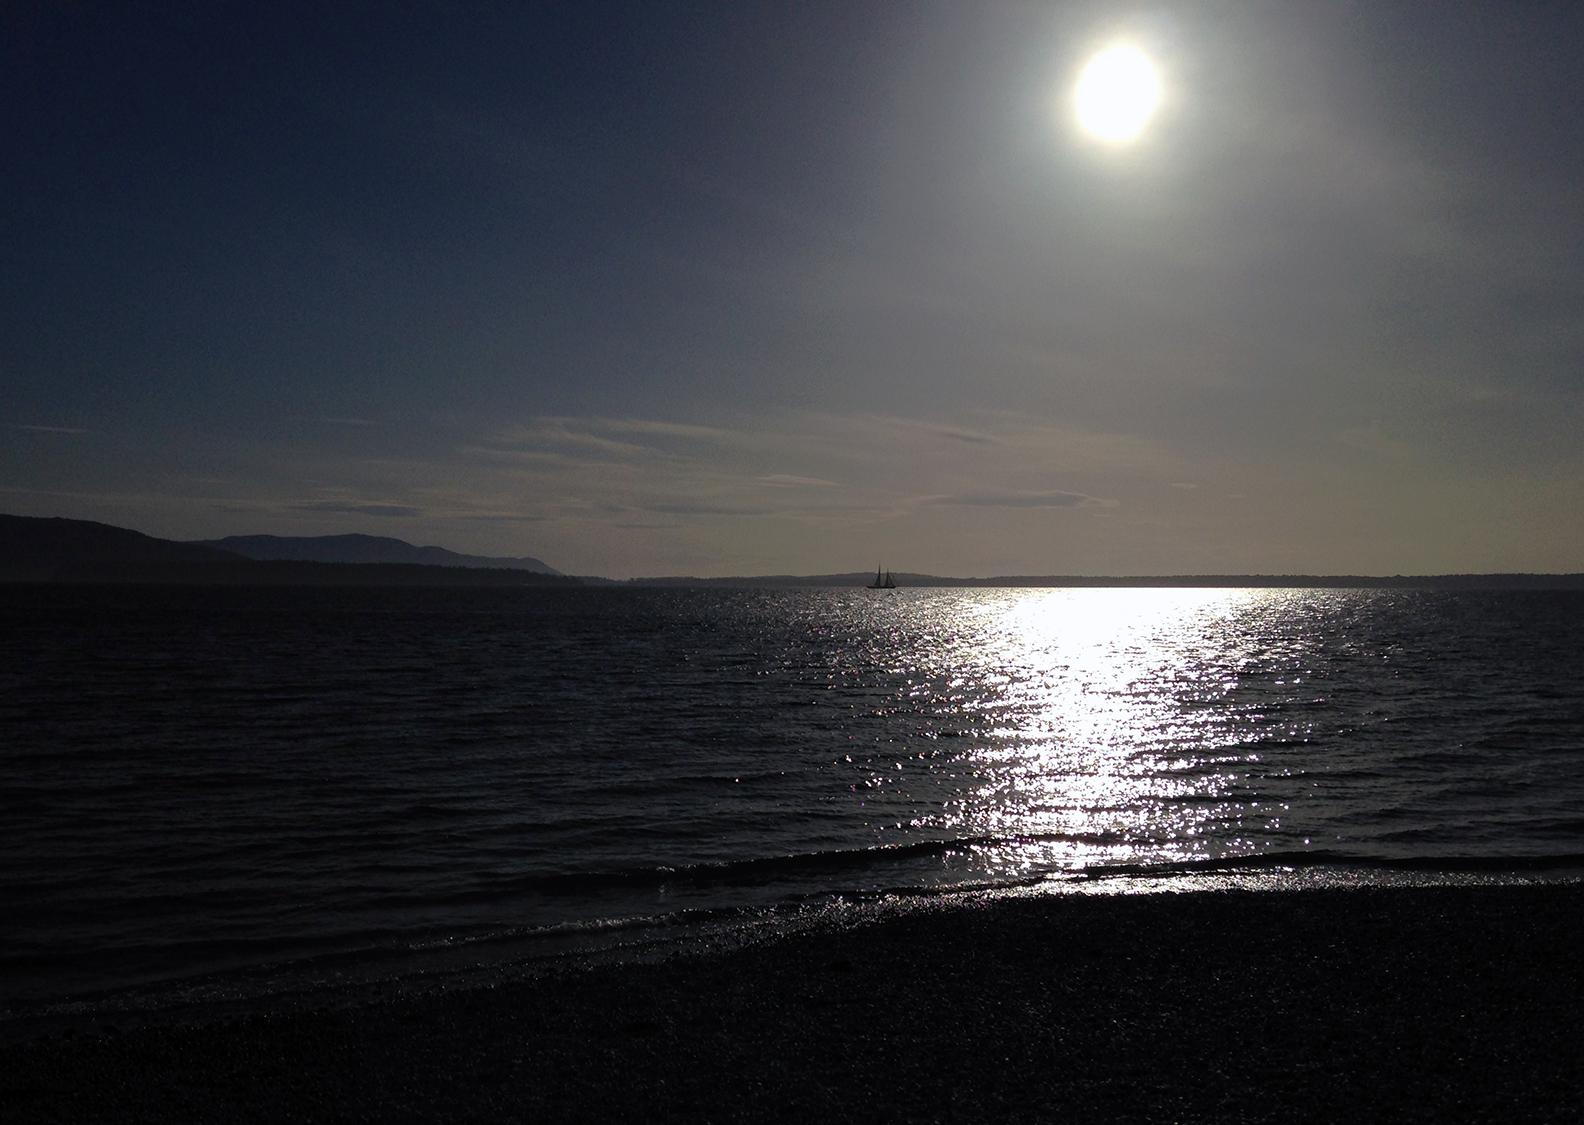 Bellingham Bay, WA